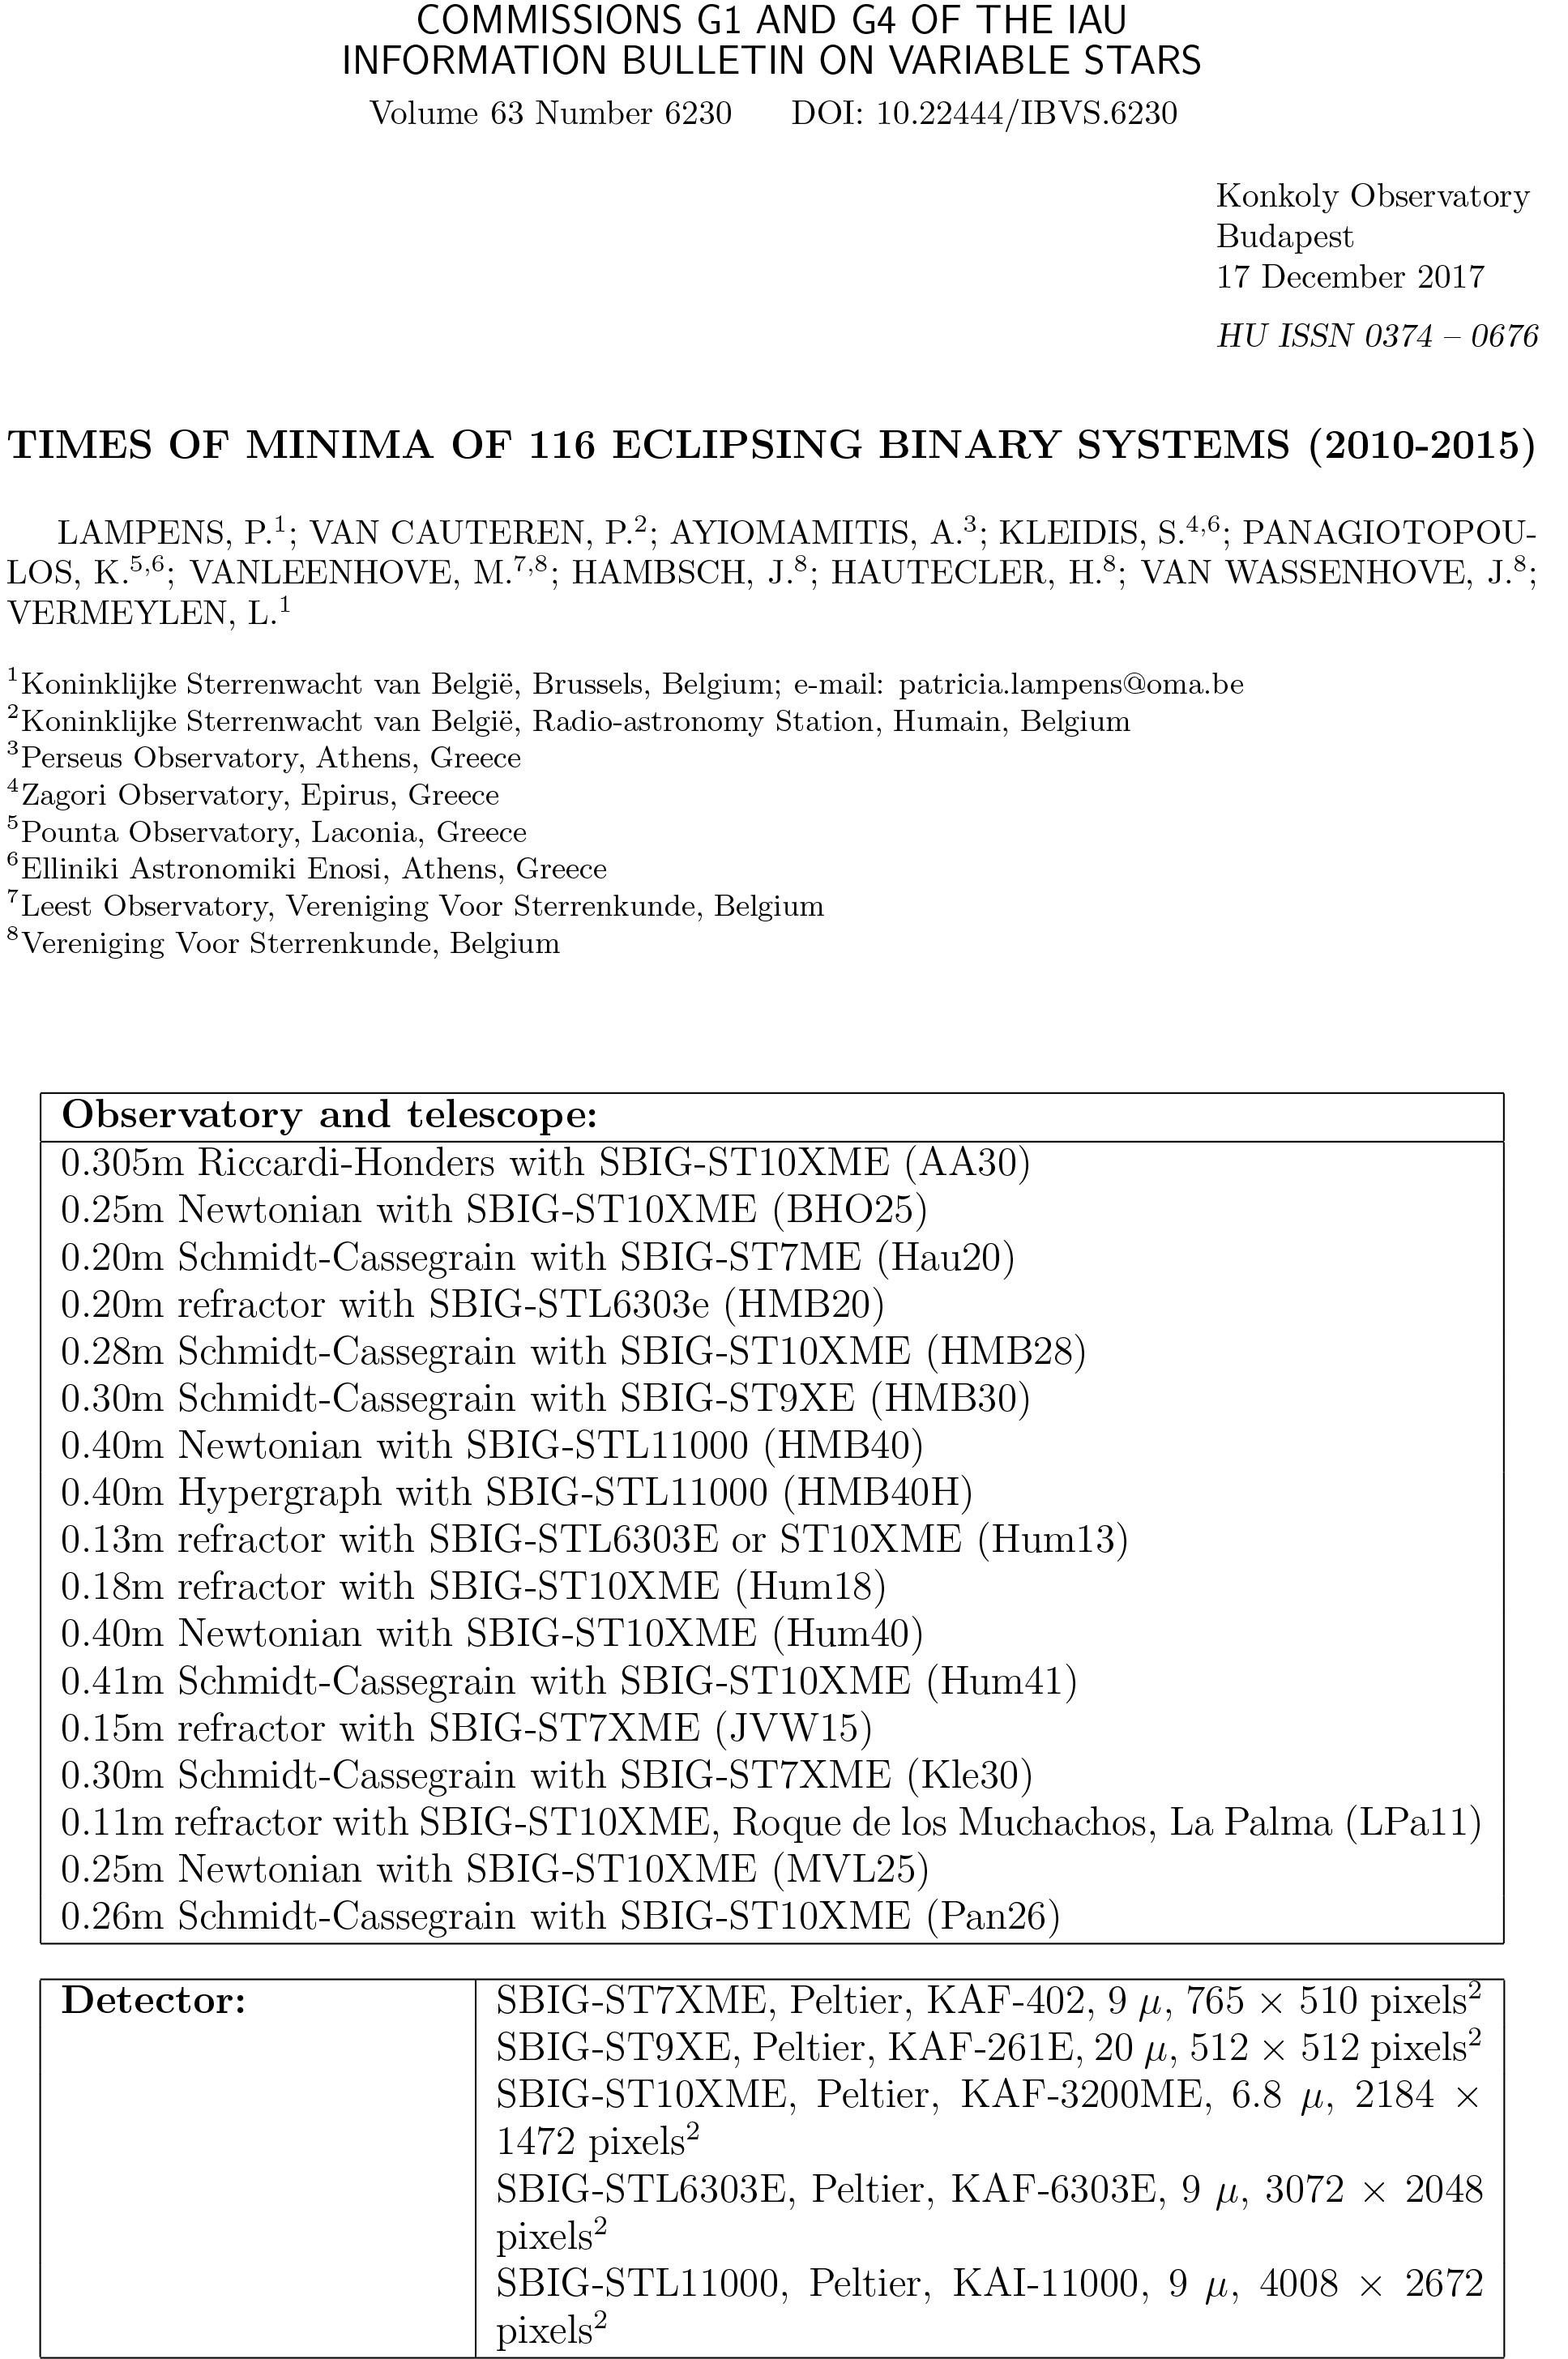 Times_of_Minima_of_116_Eclipsing_Binary_